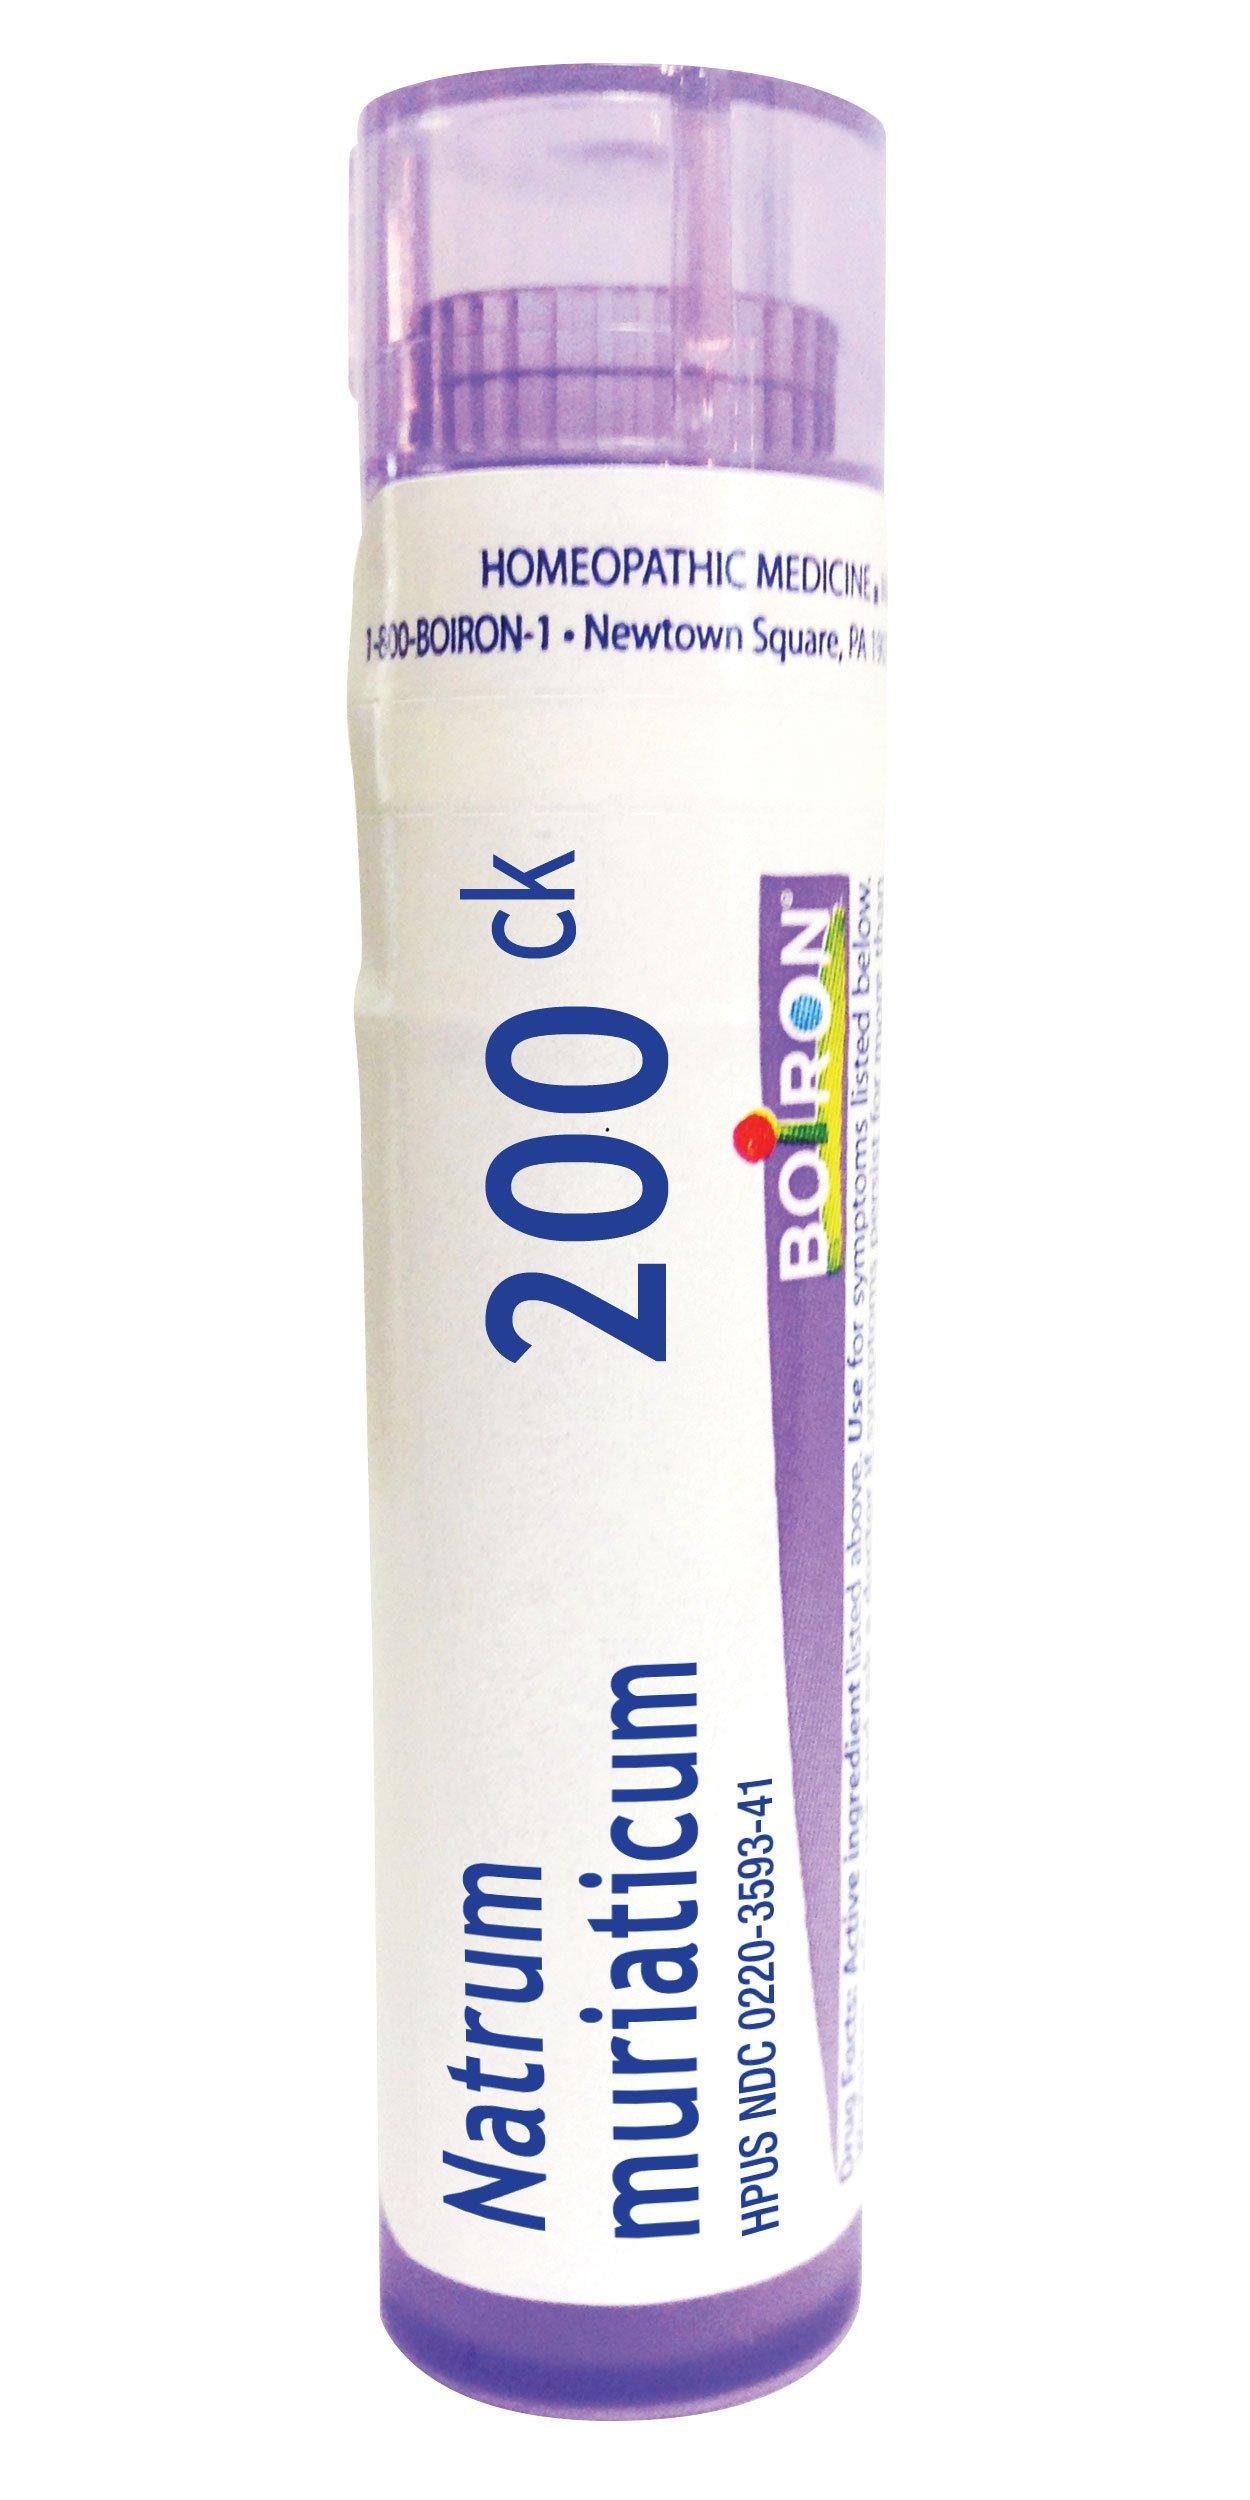 Boiron Natrum Muriaticum 200C, 80 Pellets, Homeopathic Medicine Runny Nose